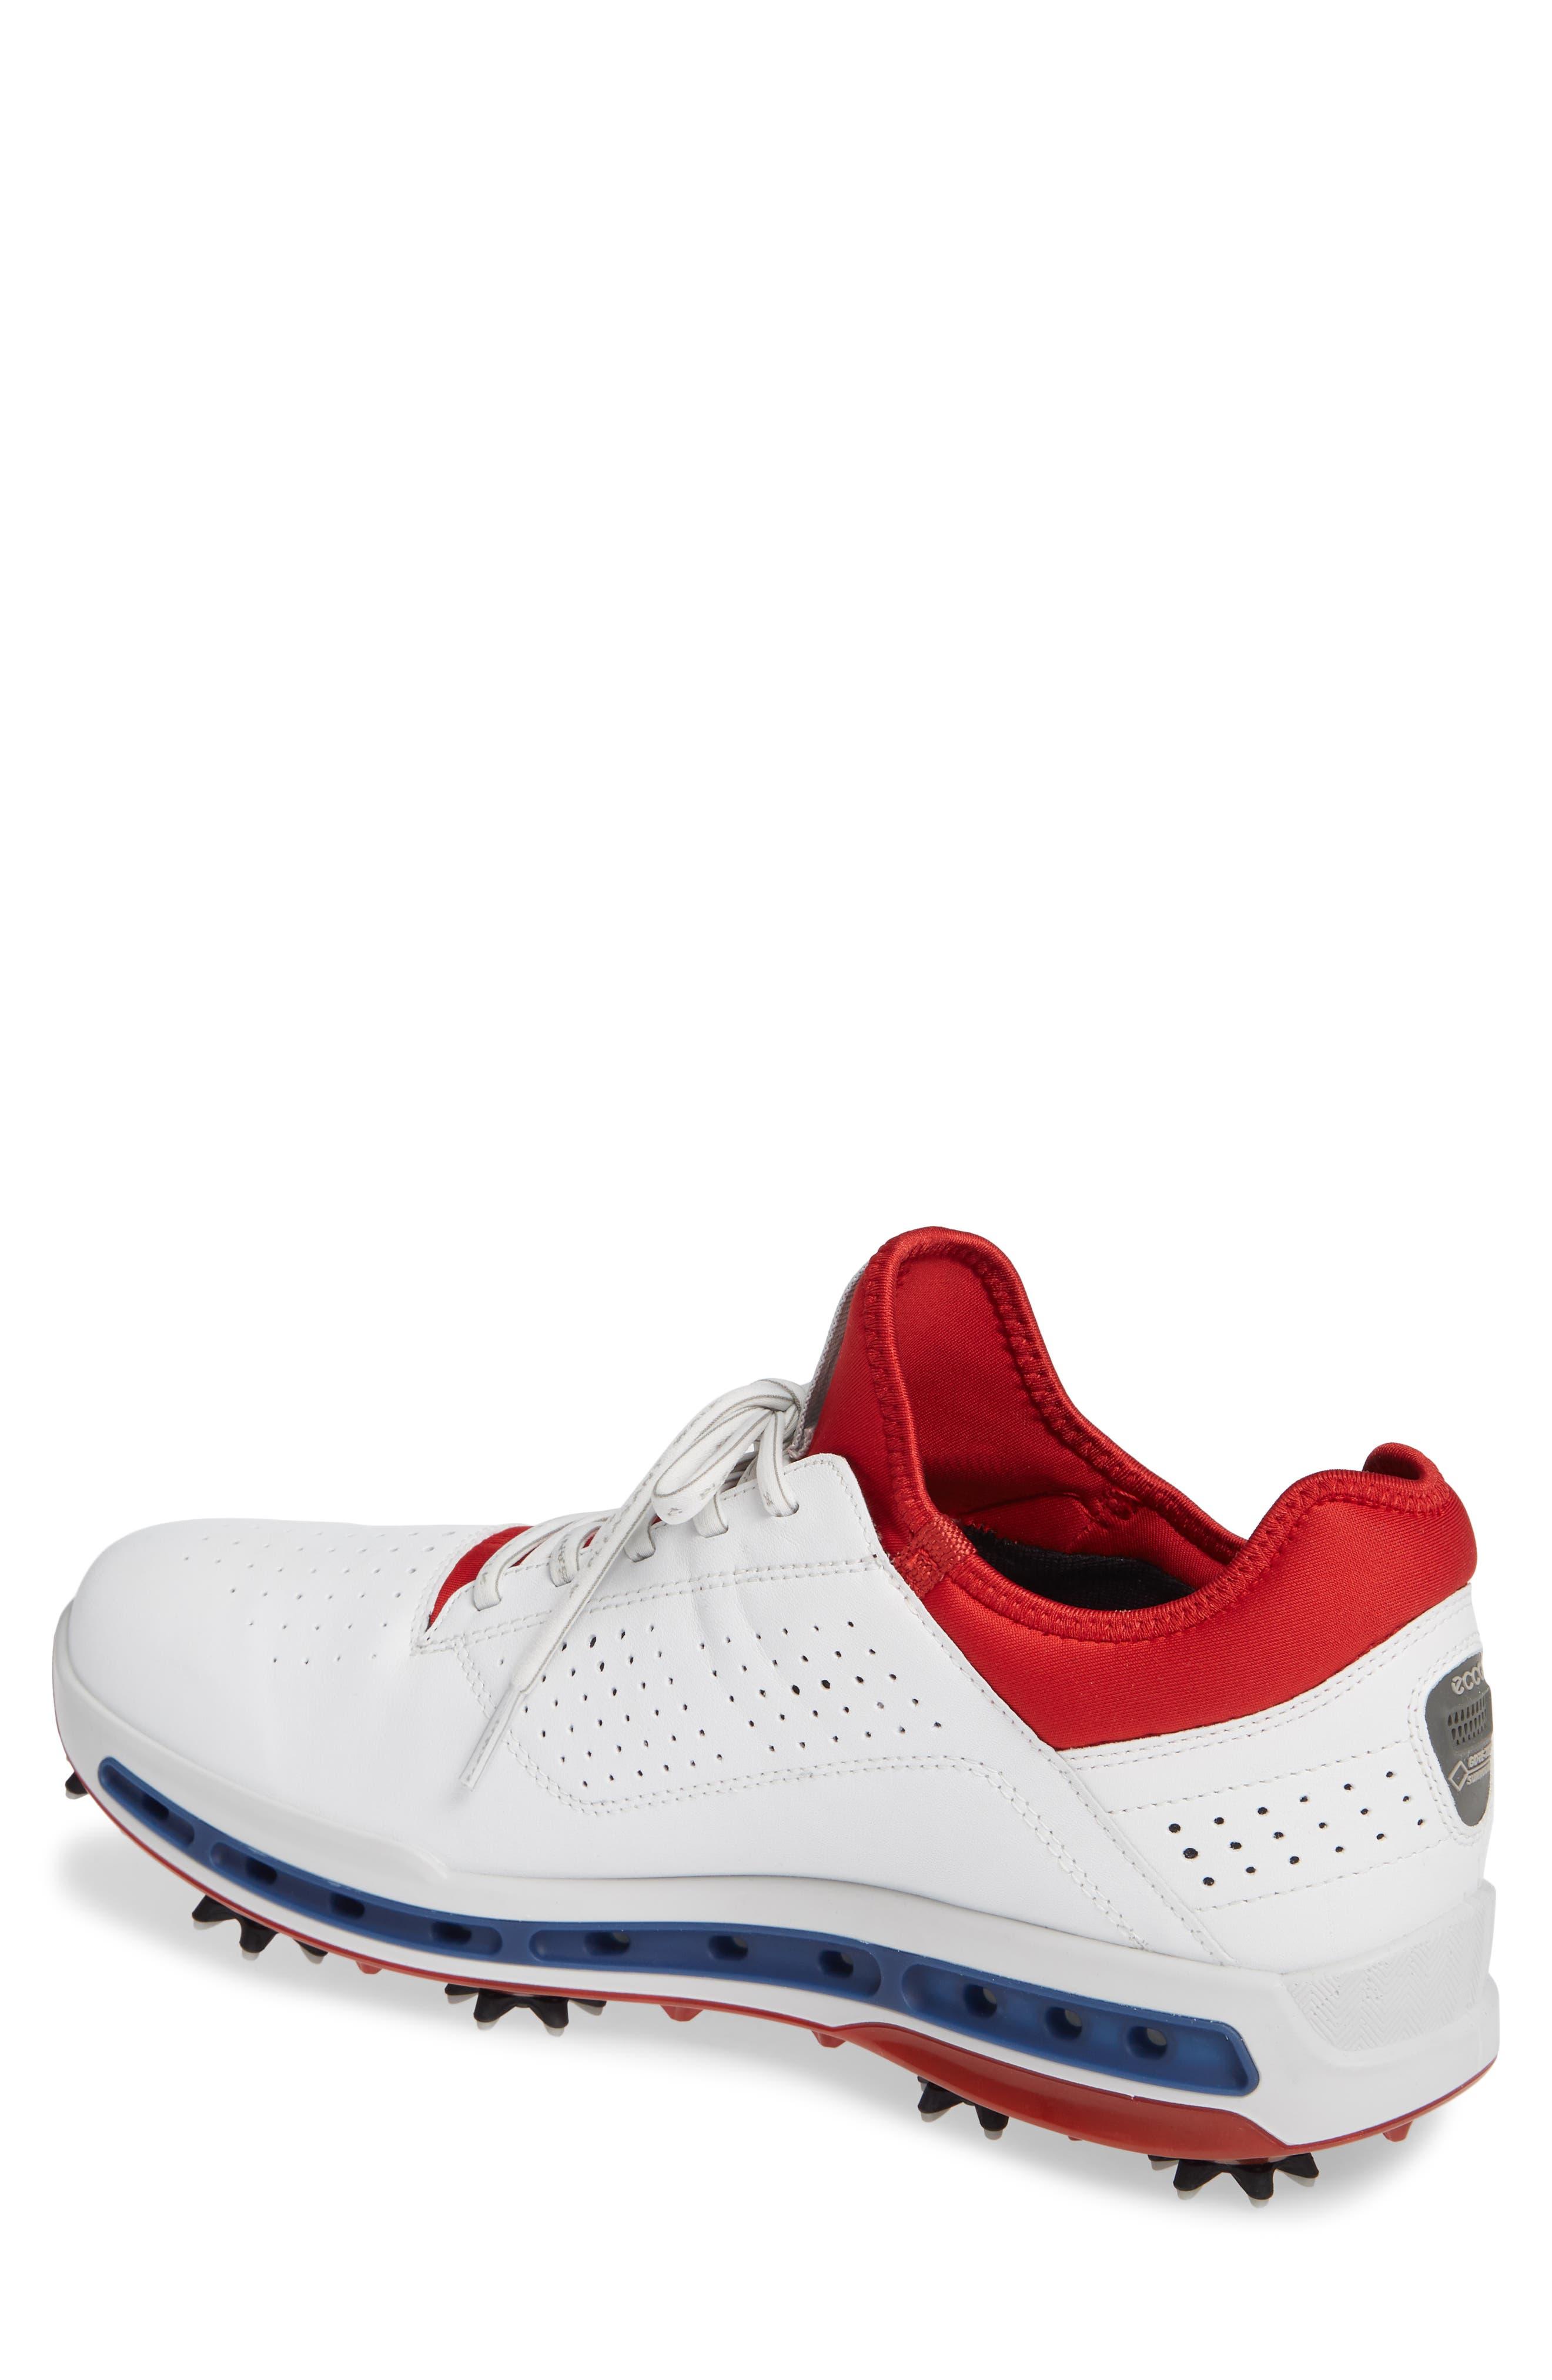 Cool 18 Gore-Tex Golf Shoe,                             Alternate thumbnail 2, color,                             WHITE/ TOMATO